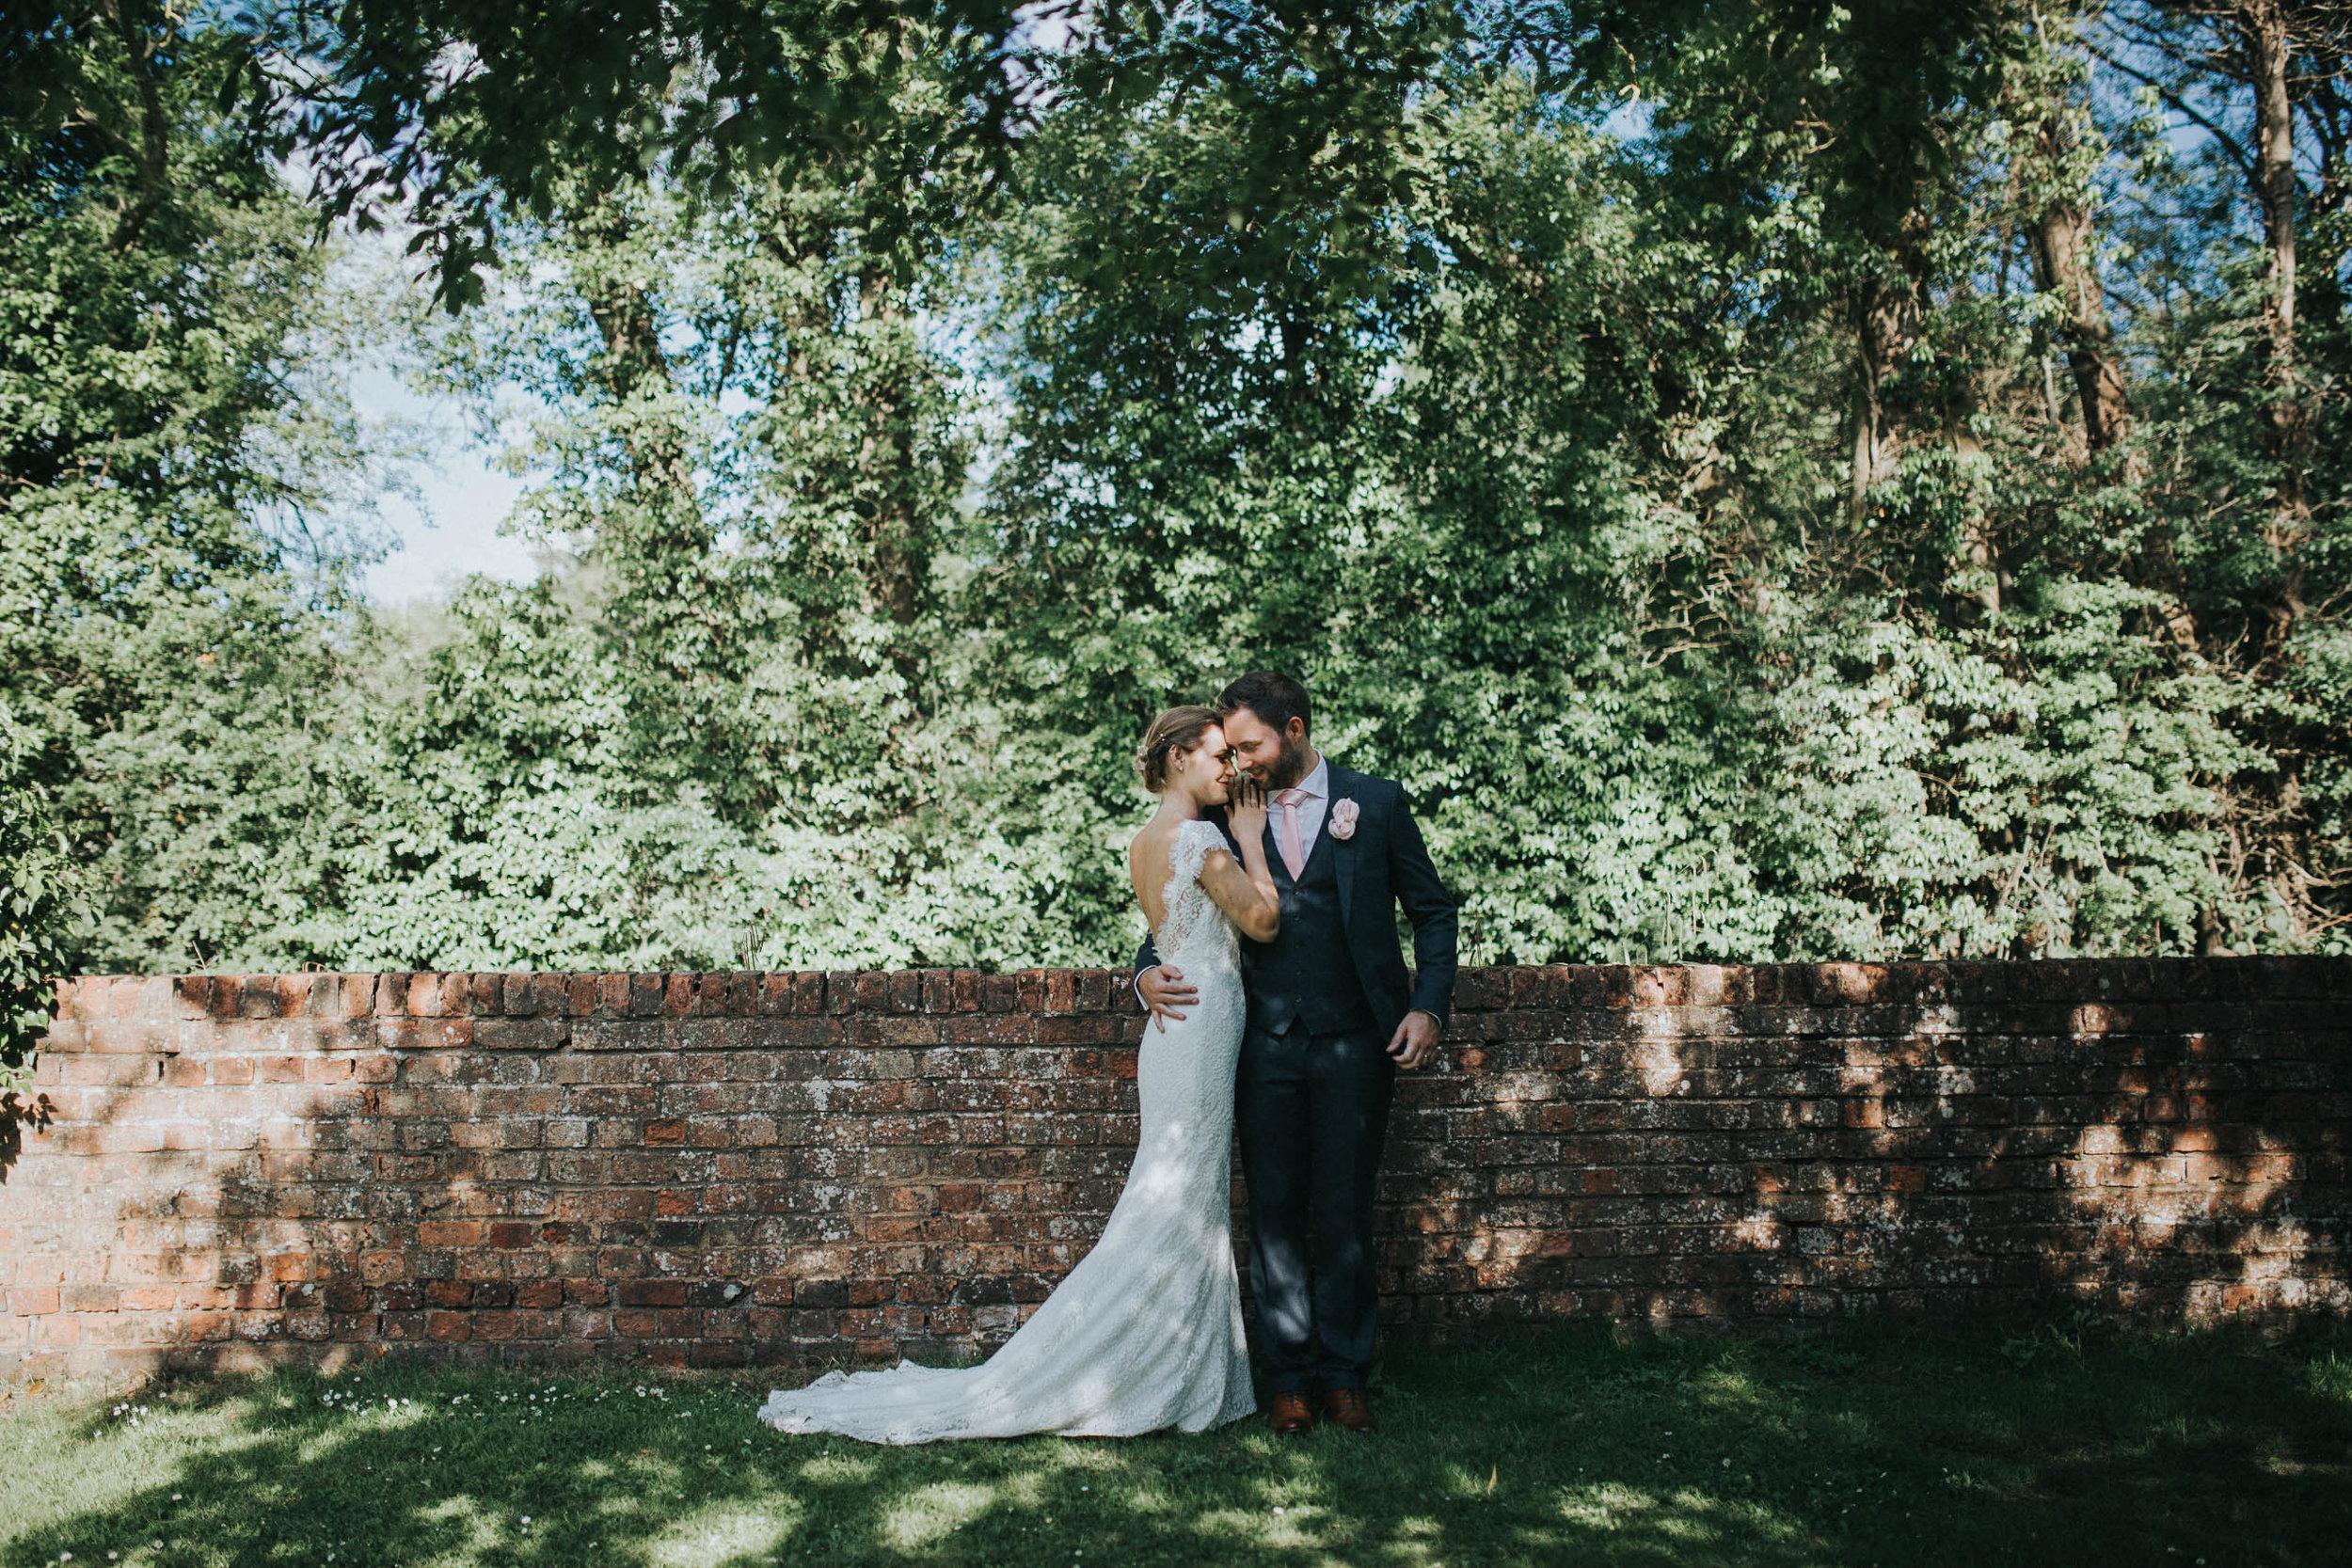 WeddingPhotographerEastSussex-4.jpg